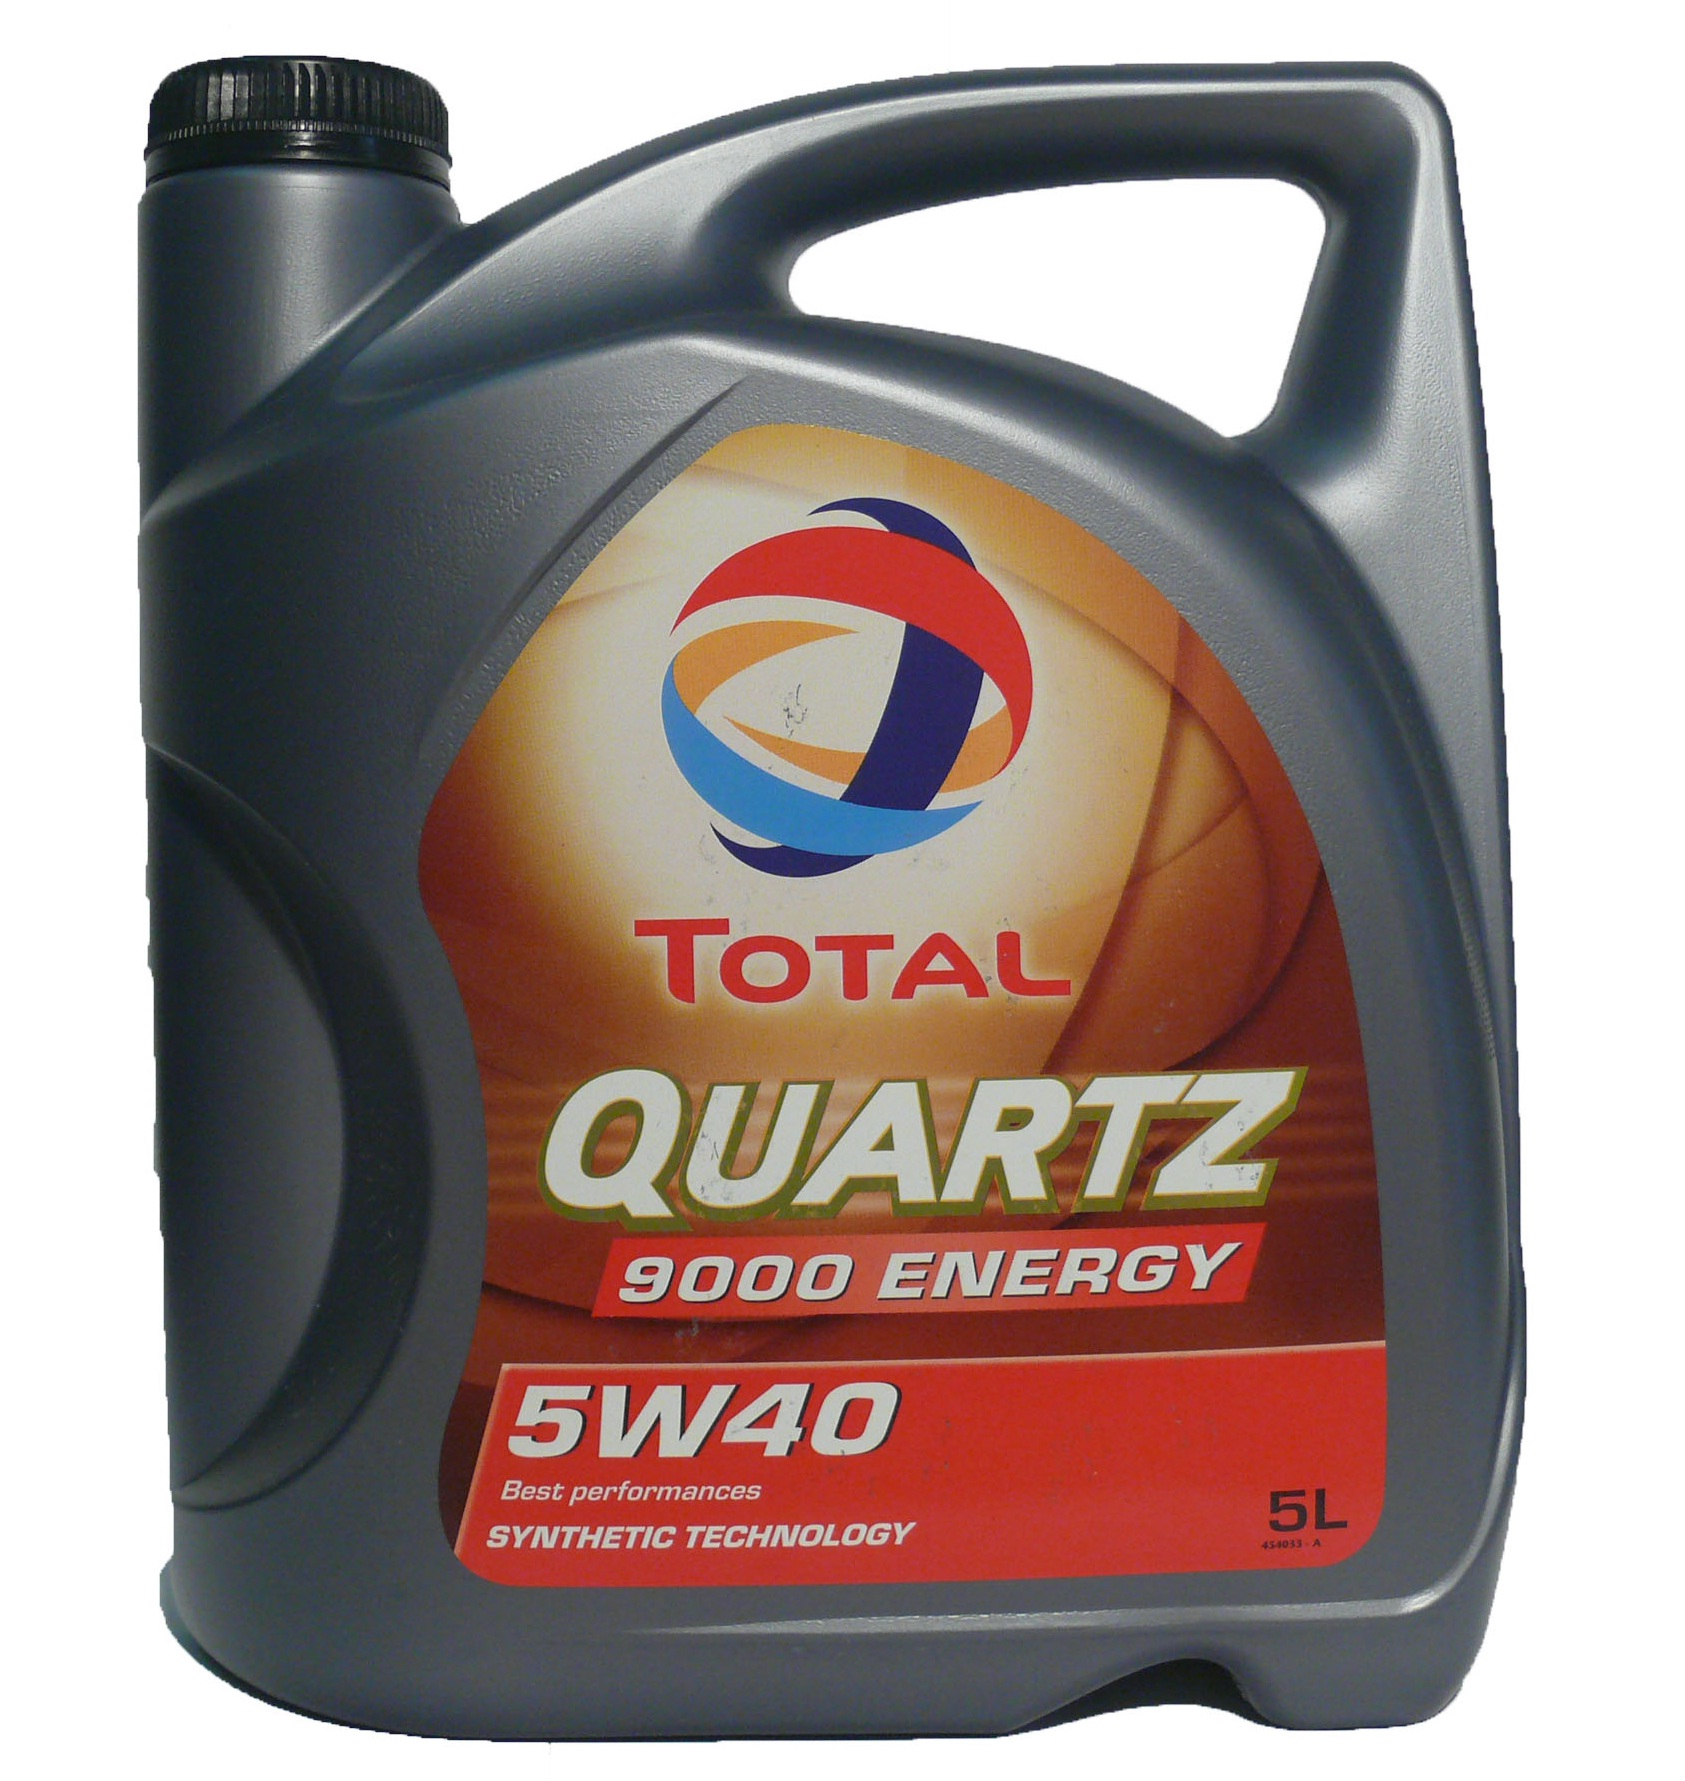 Total Quartz Energy 9000 5W-40 5L plně syntetický motorový olej 5L